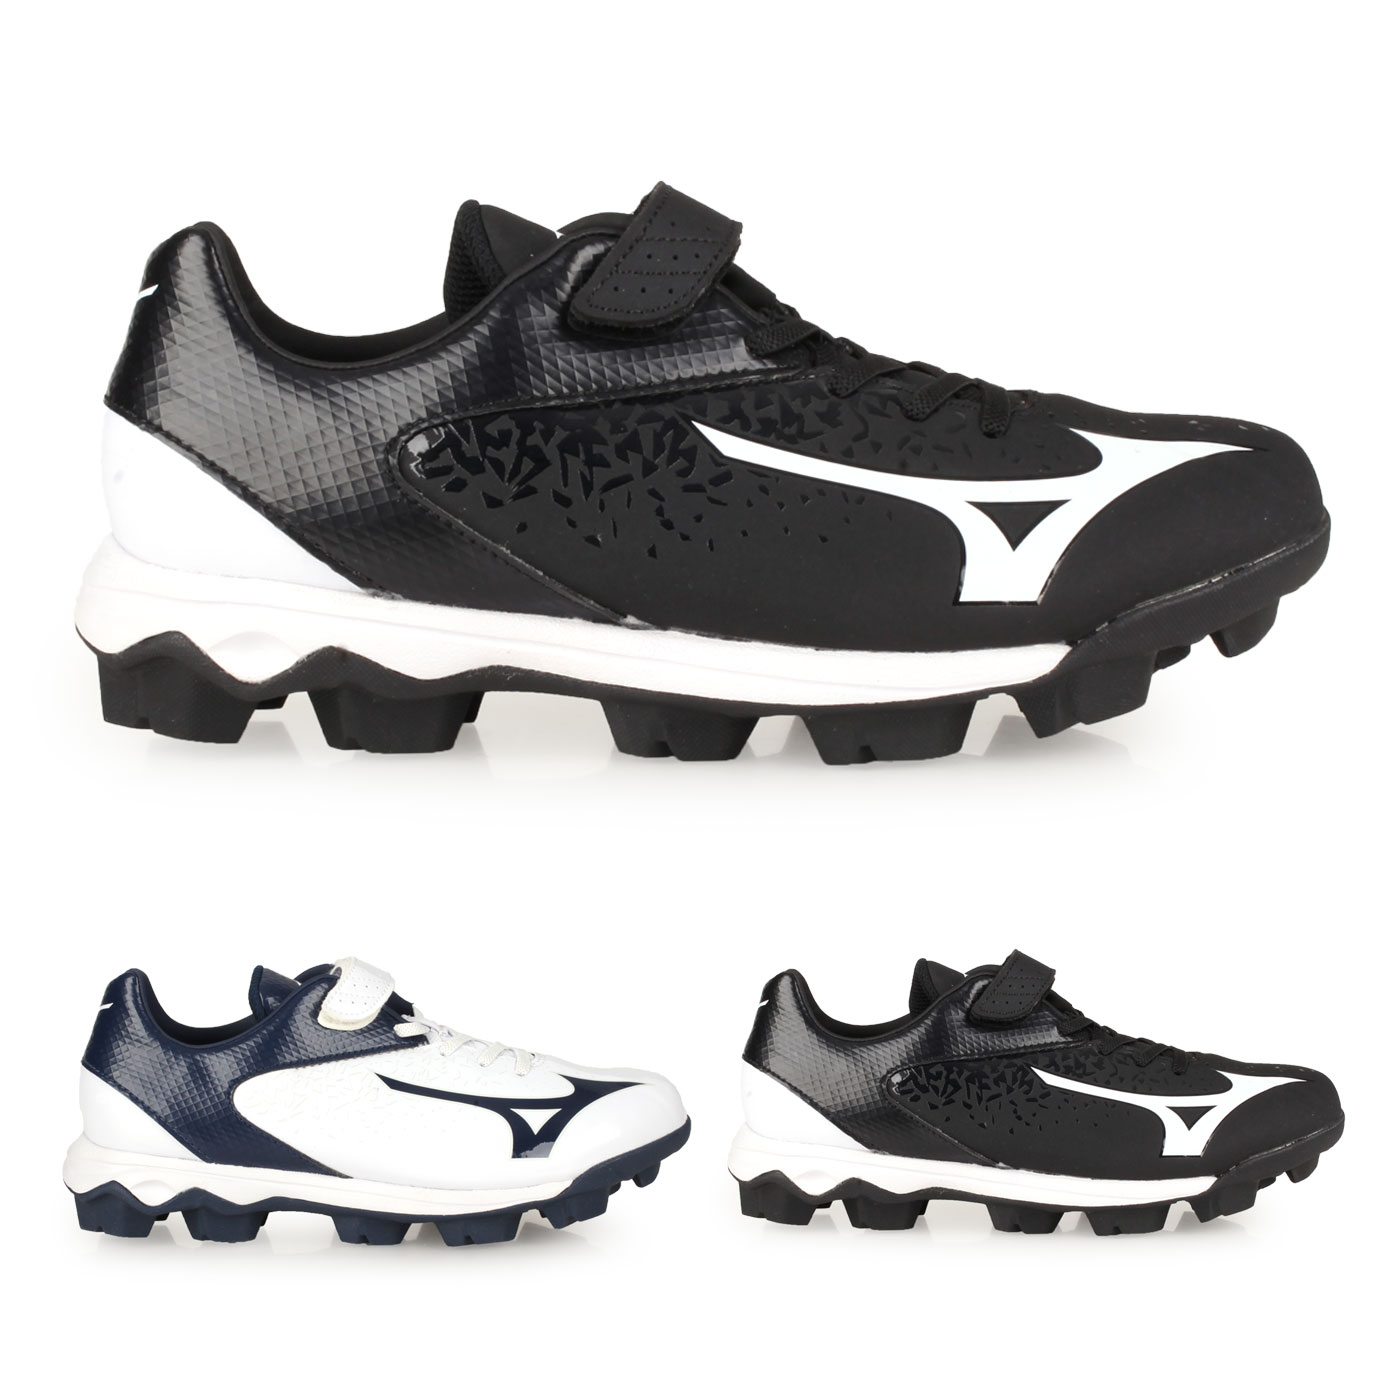 MIZUNO 兒童棒壘球鞋-WIDE  @WAVE SELECT NINE Jr.@11GP192509